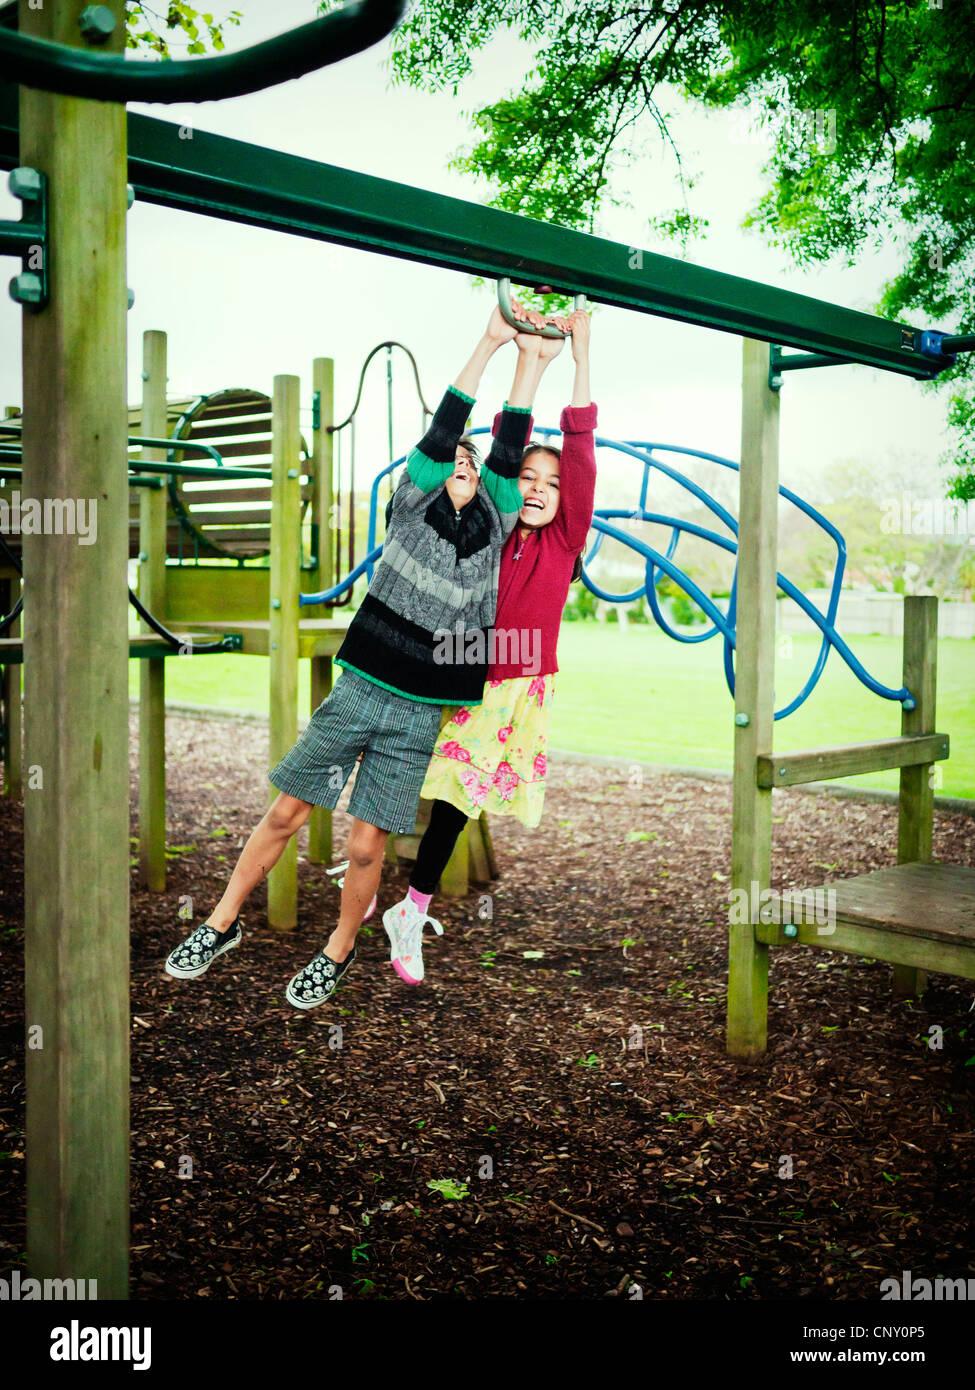 Niño y niña columpio juntos en columpios. Imagen De Stock